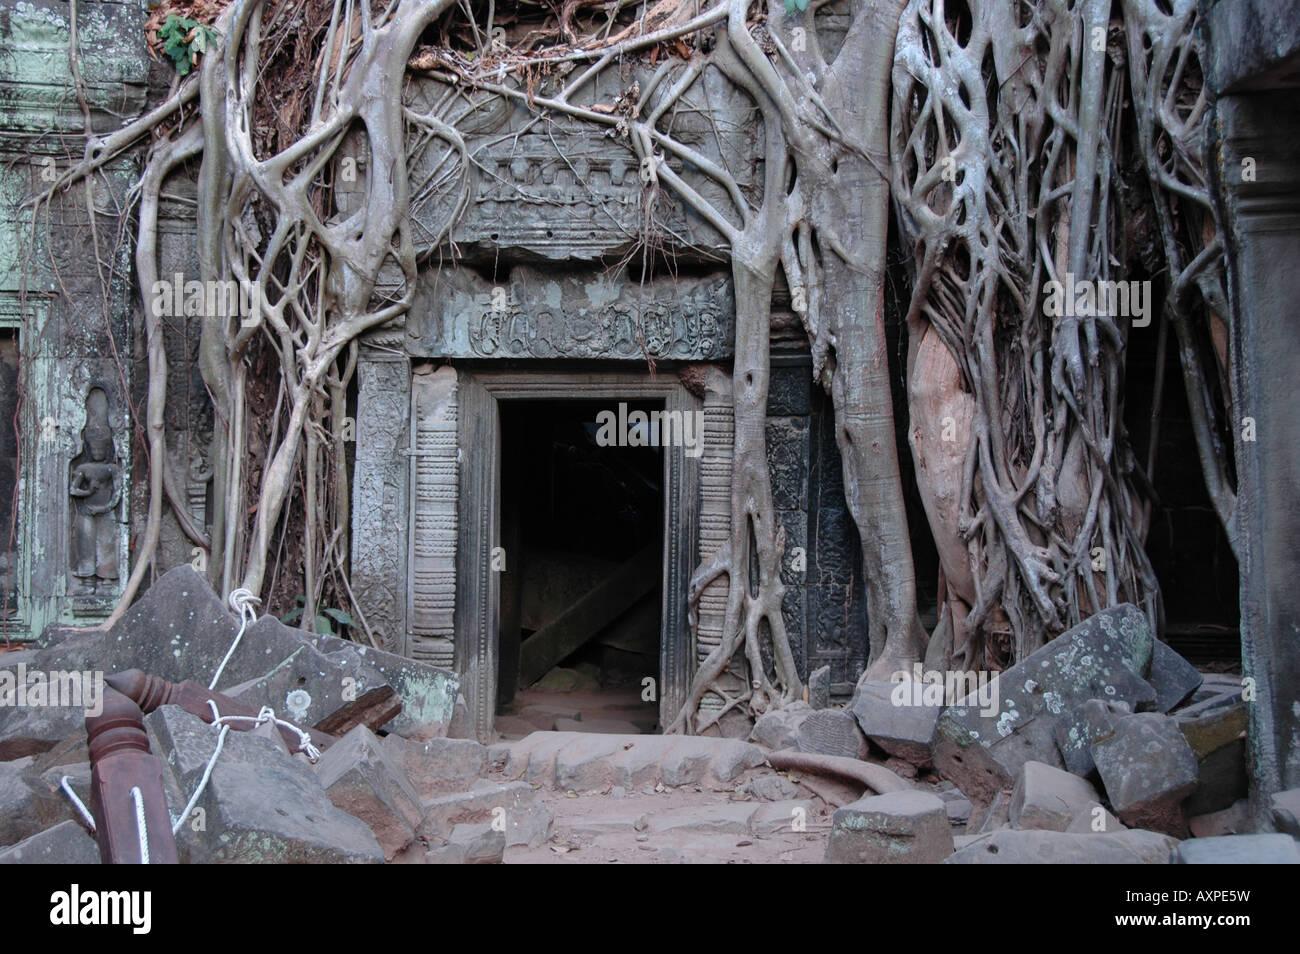 Strangler fig around the doorway used in the Film Lara Croft Tomb Raider at the Ta Prohn temple, near Siem Reap, - Stock Image